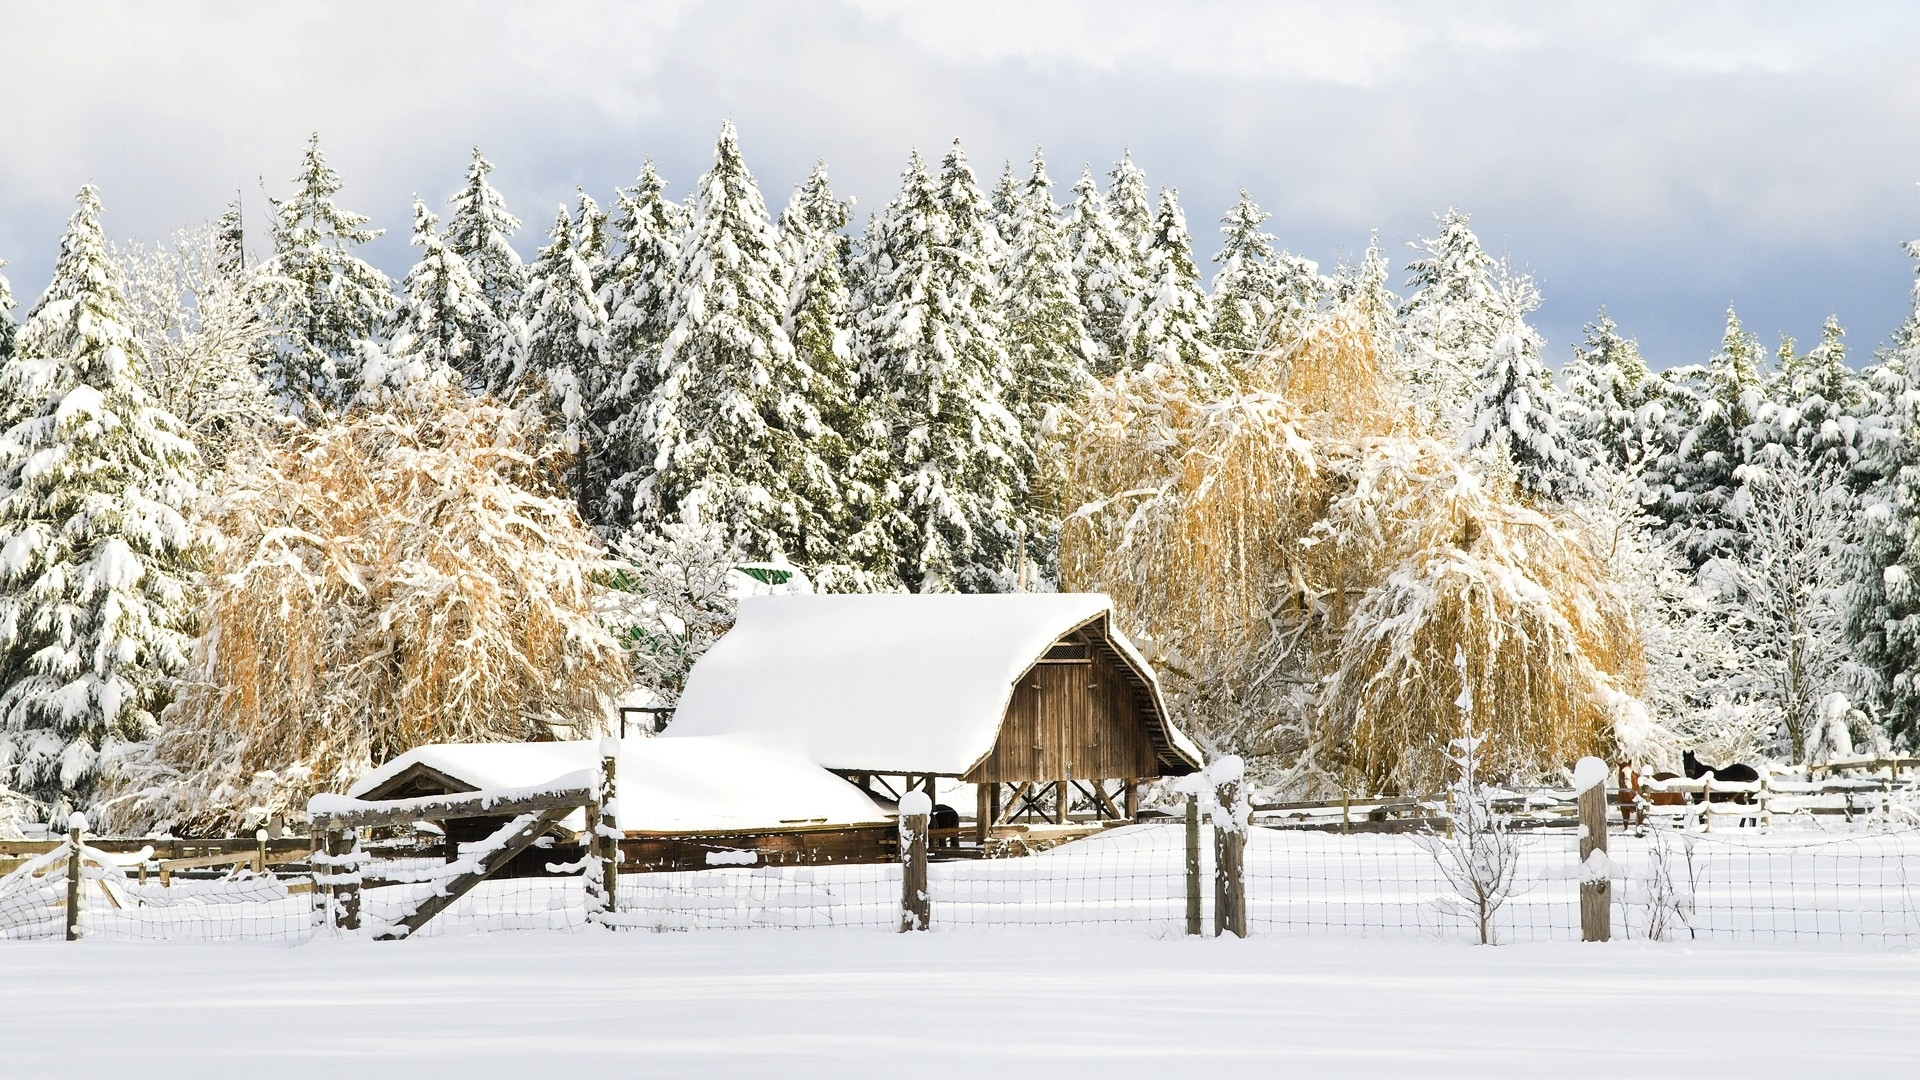 1920x1080 nature snow world country christmas british columbia barn 1920x1080